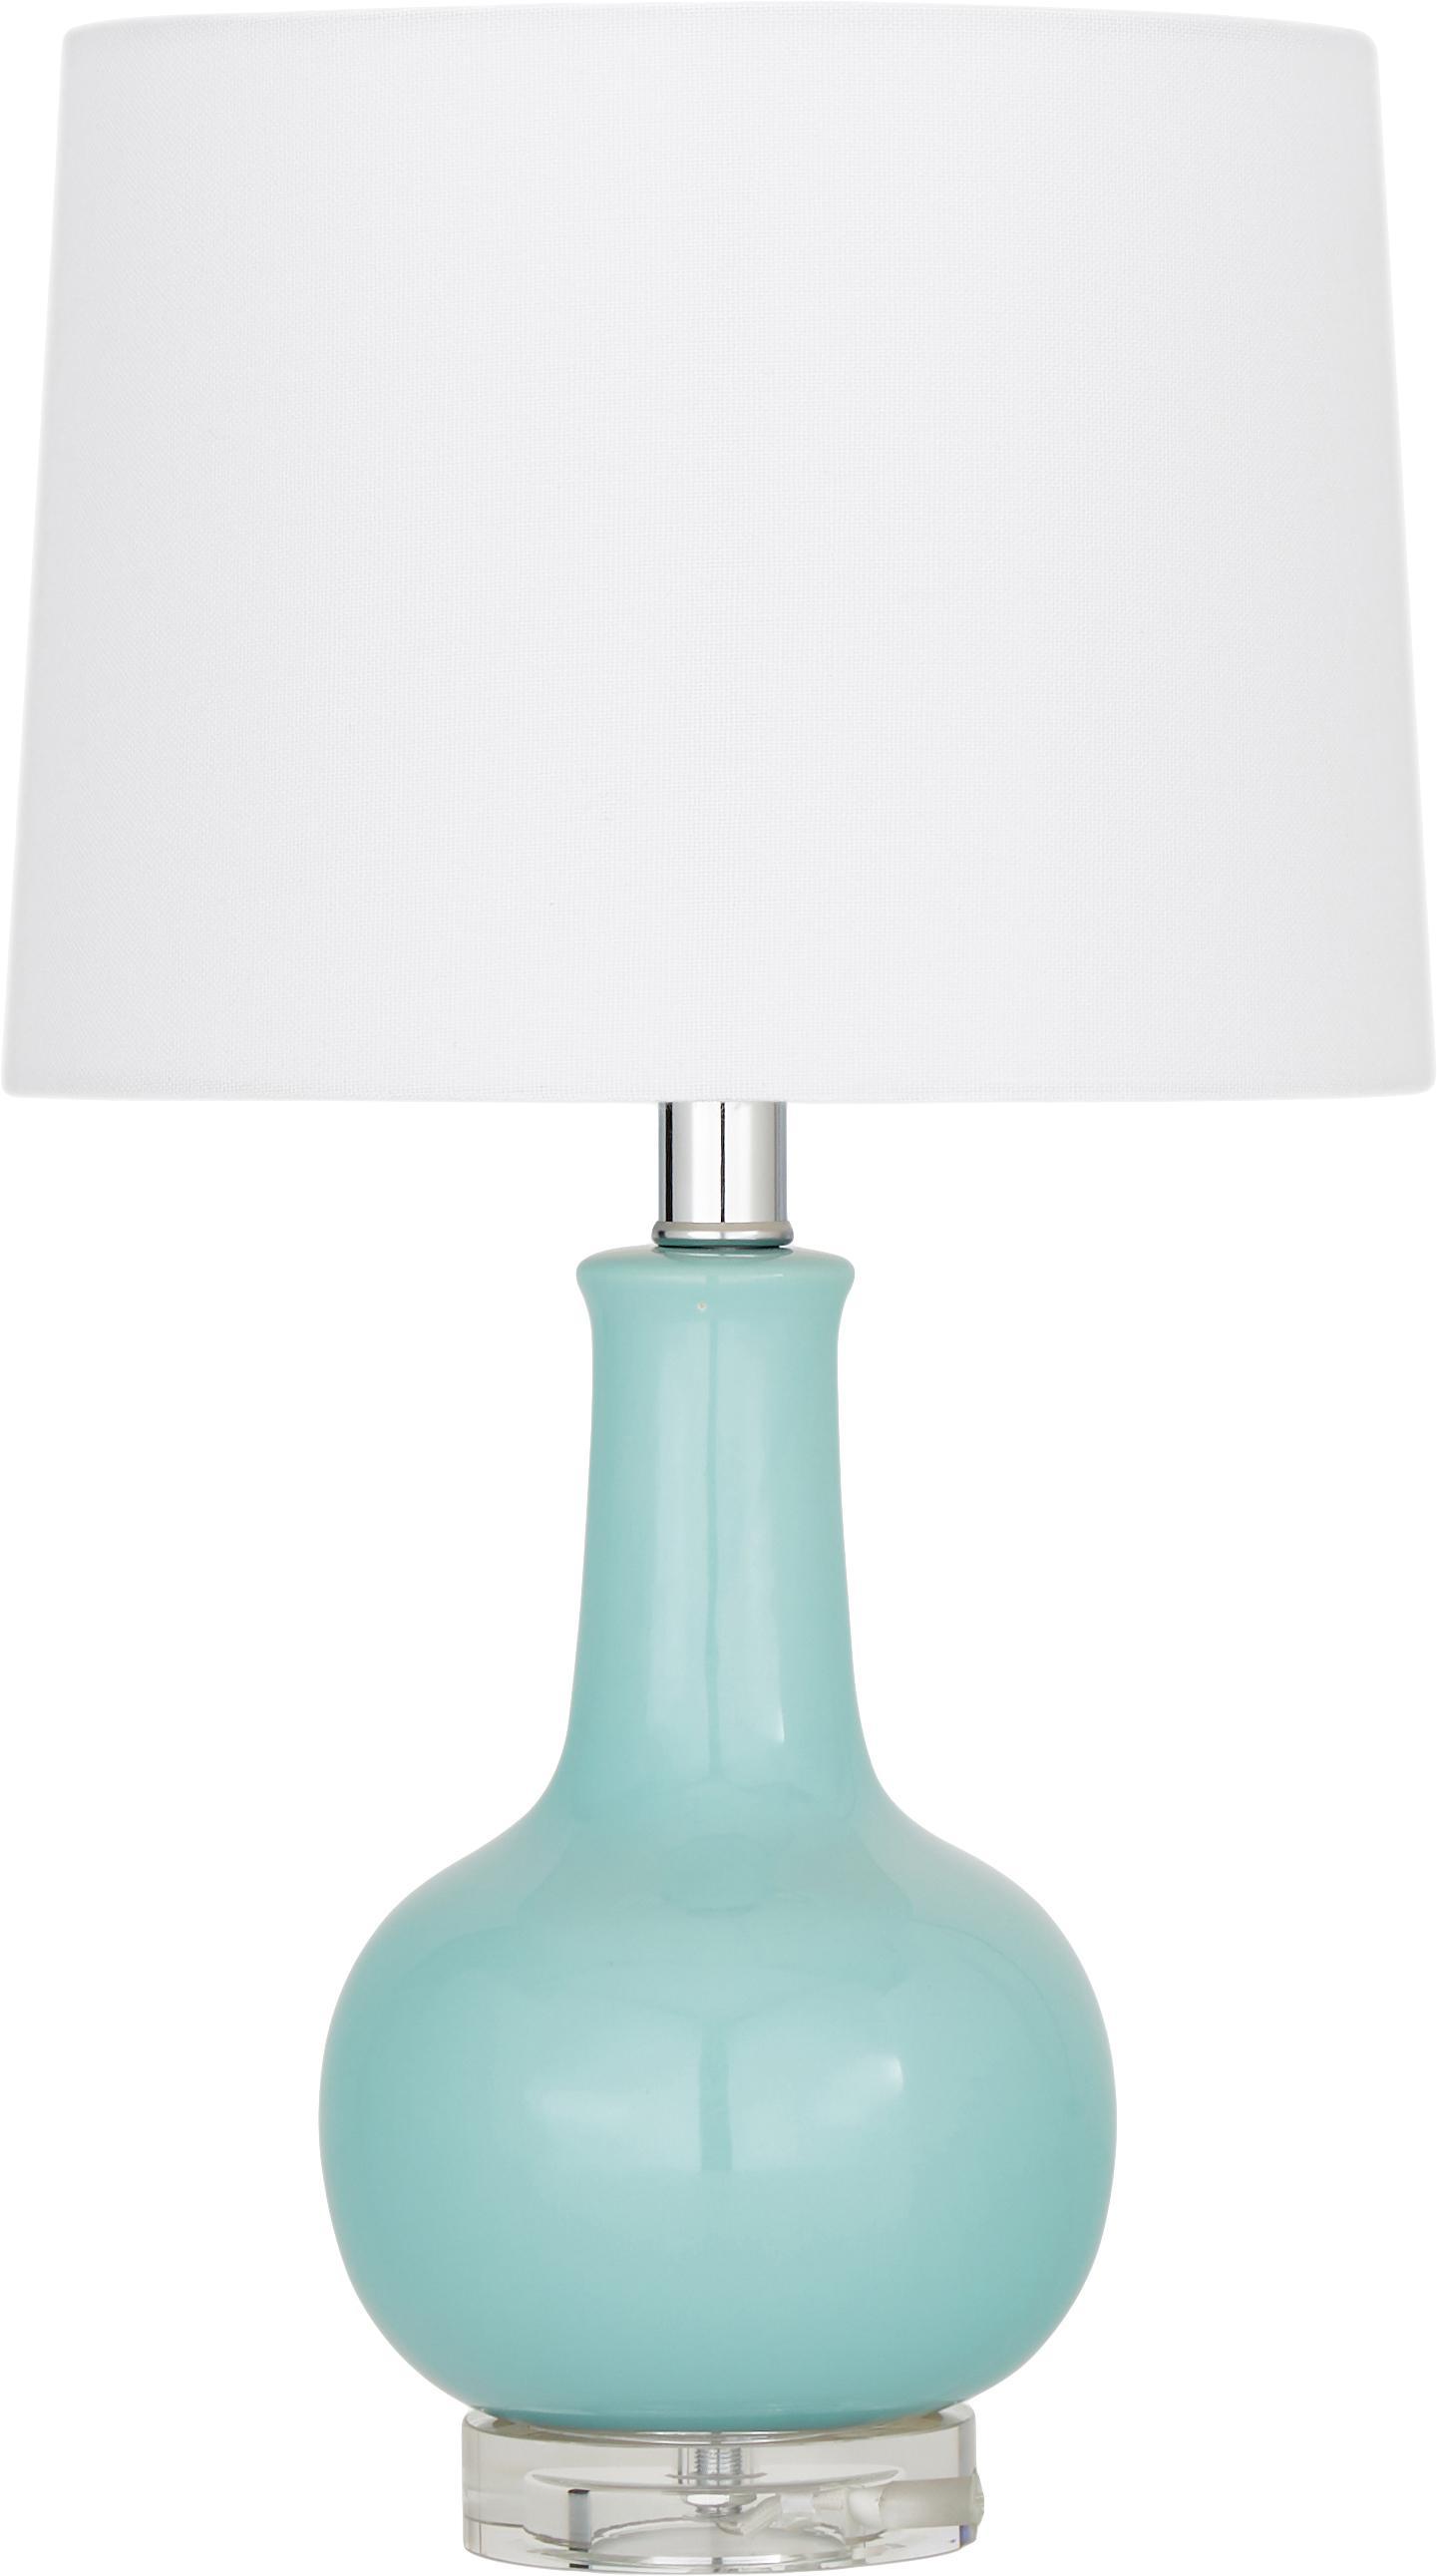 Keramische tafellamp Brittany, Lampenkap: textiel, Lampvoet: keramiek, kristalglas, Wit, turquoise, Ø 28 x H 48 cm